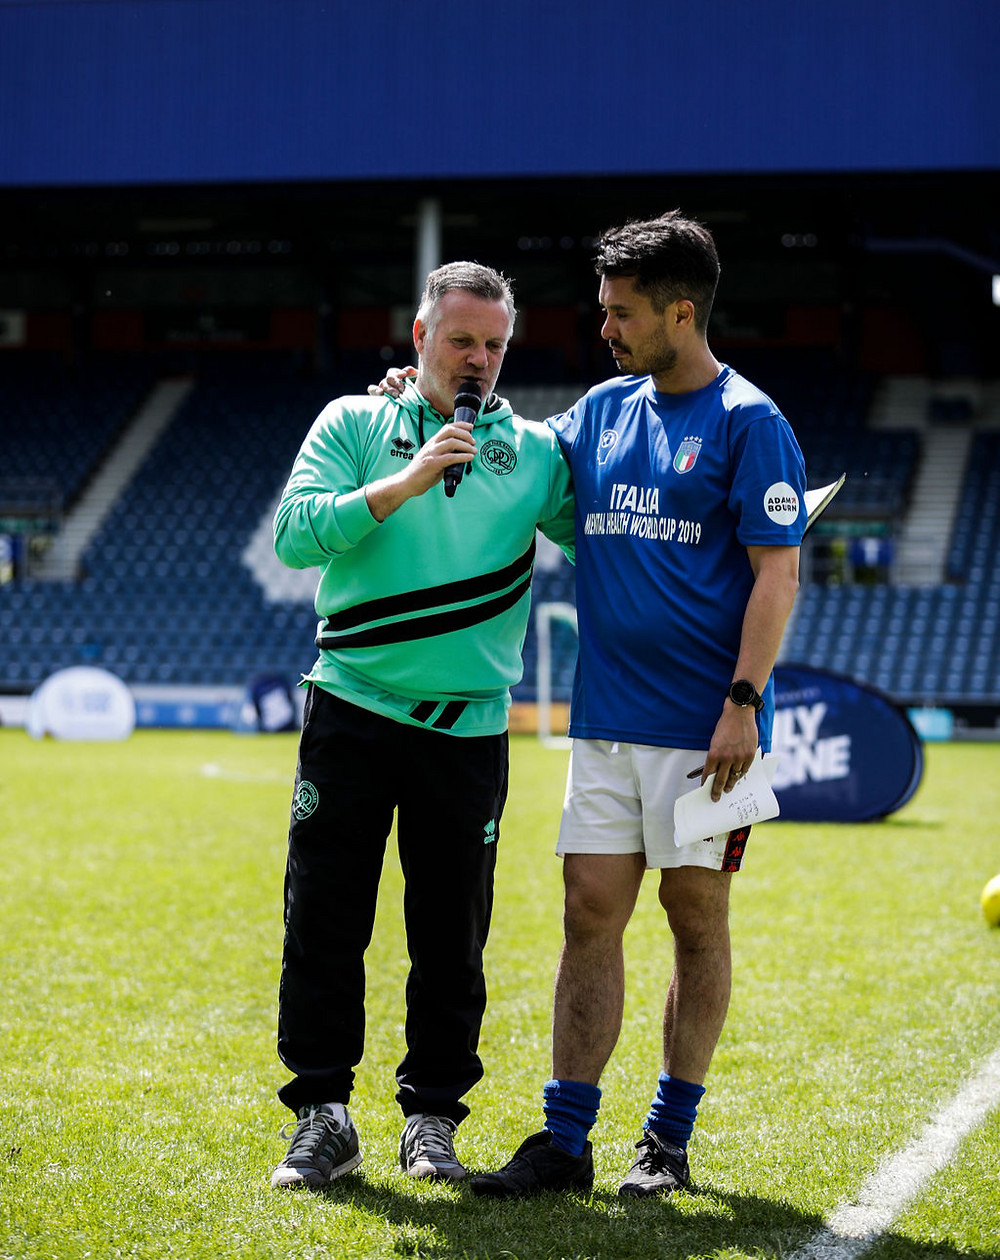 Andy Sinton Mental Health World Cup